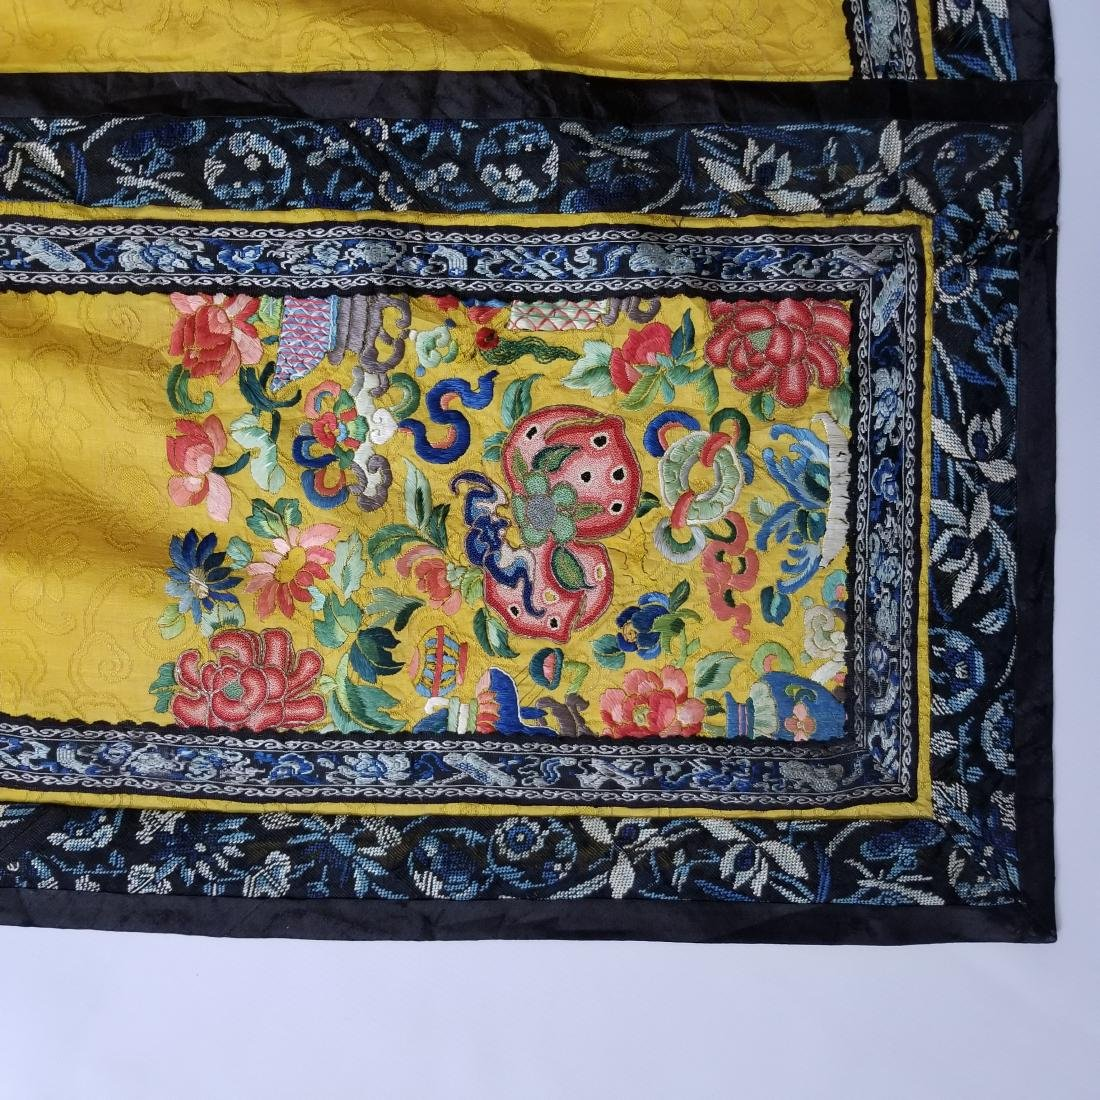 Antique Chinese Silk Hand Embroidered Skirt Forbidden - 2